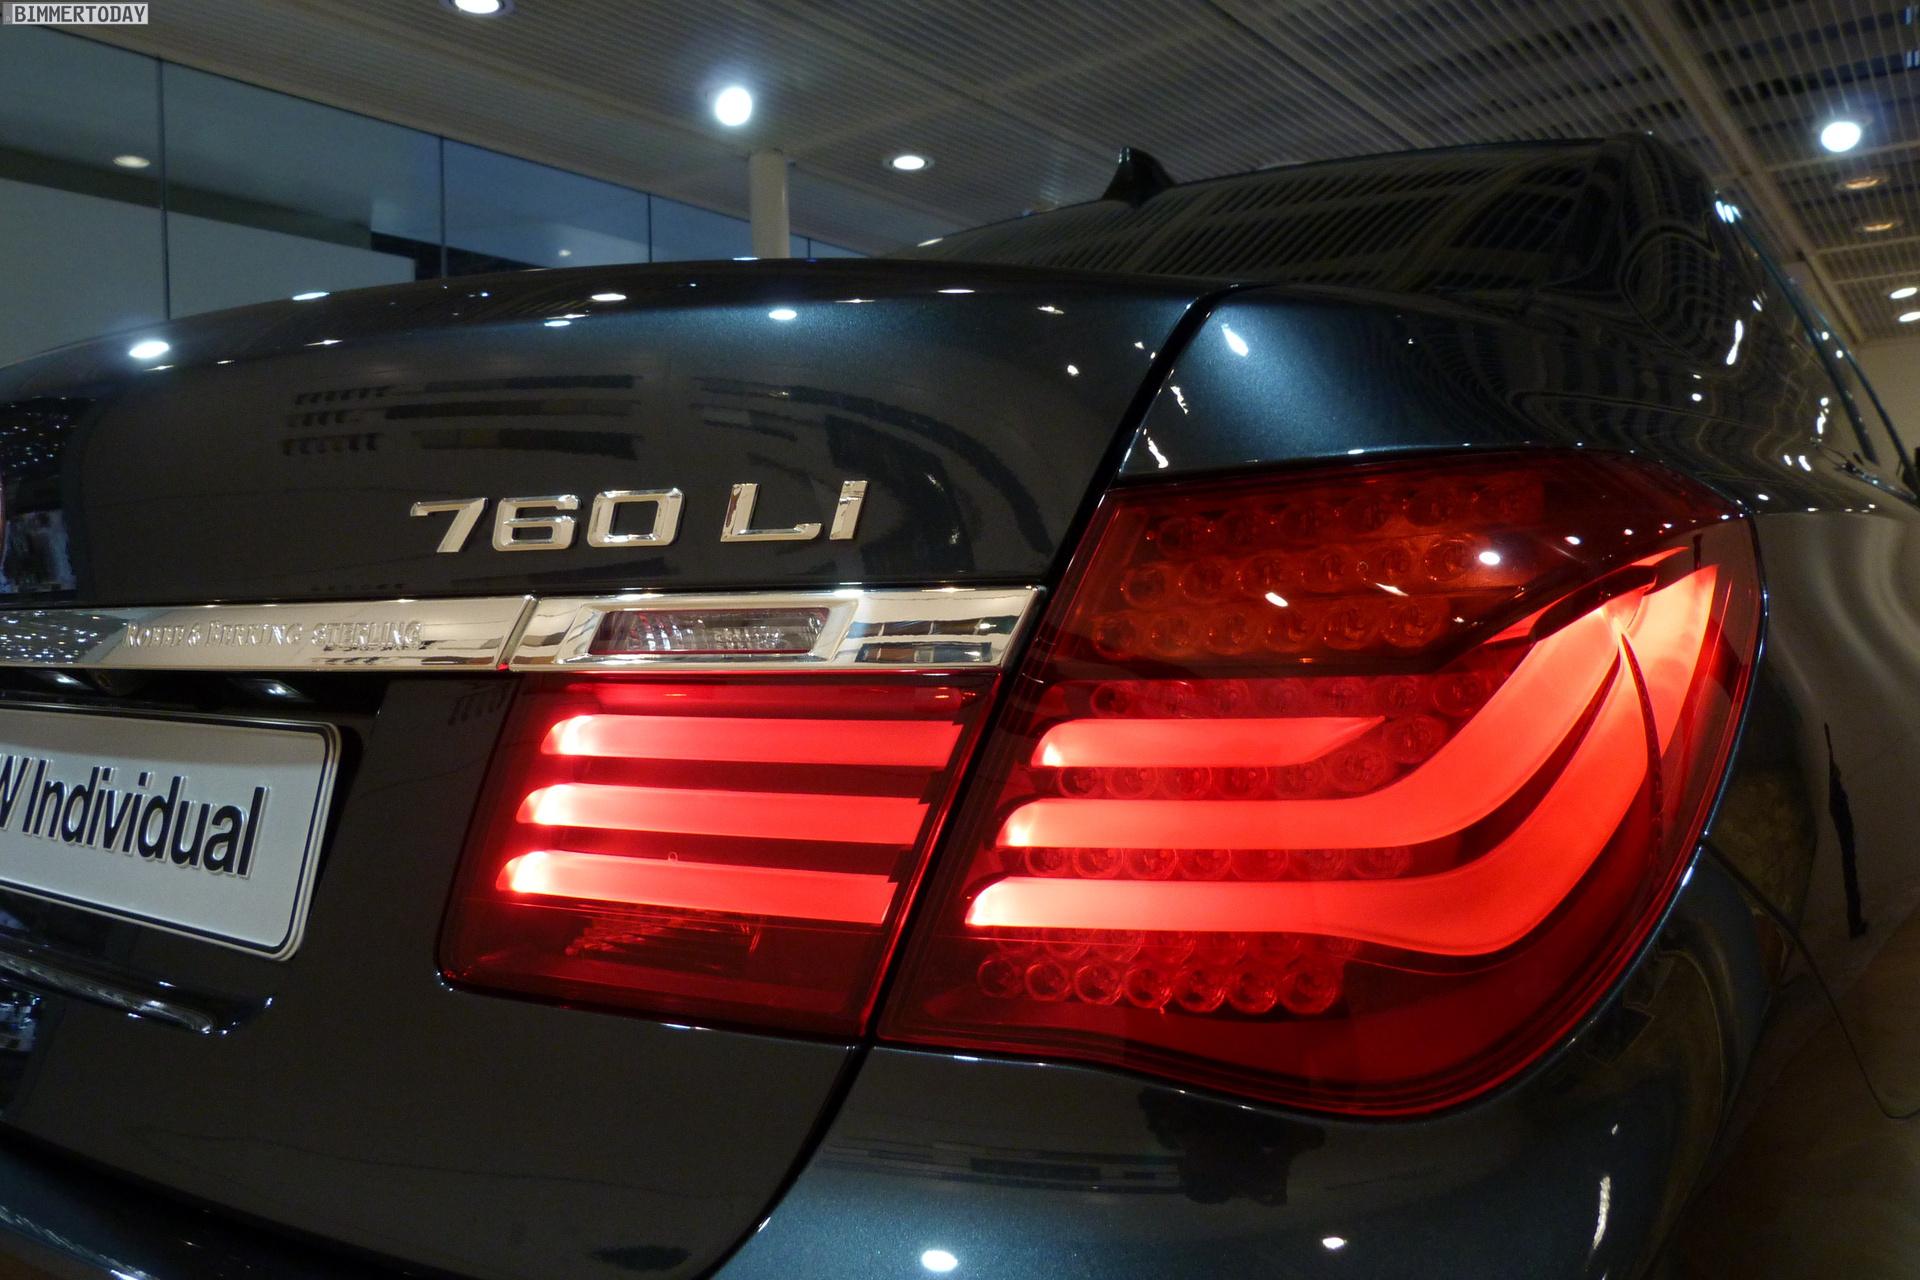 BMW 760li Sterling Individual 7er Inspired Robbe Berking Genf Autosalon 2014 LIVE 26